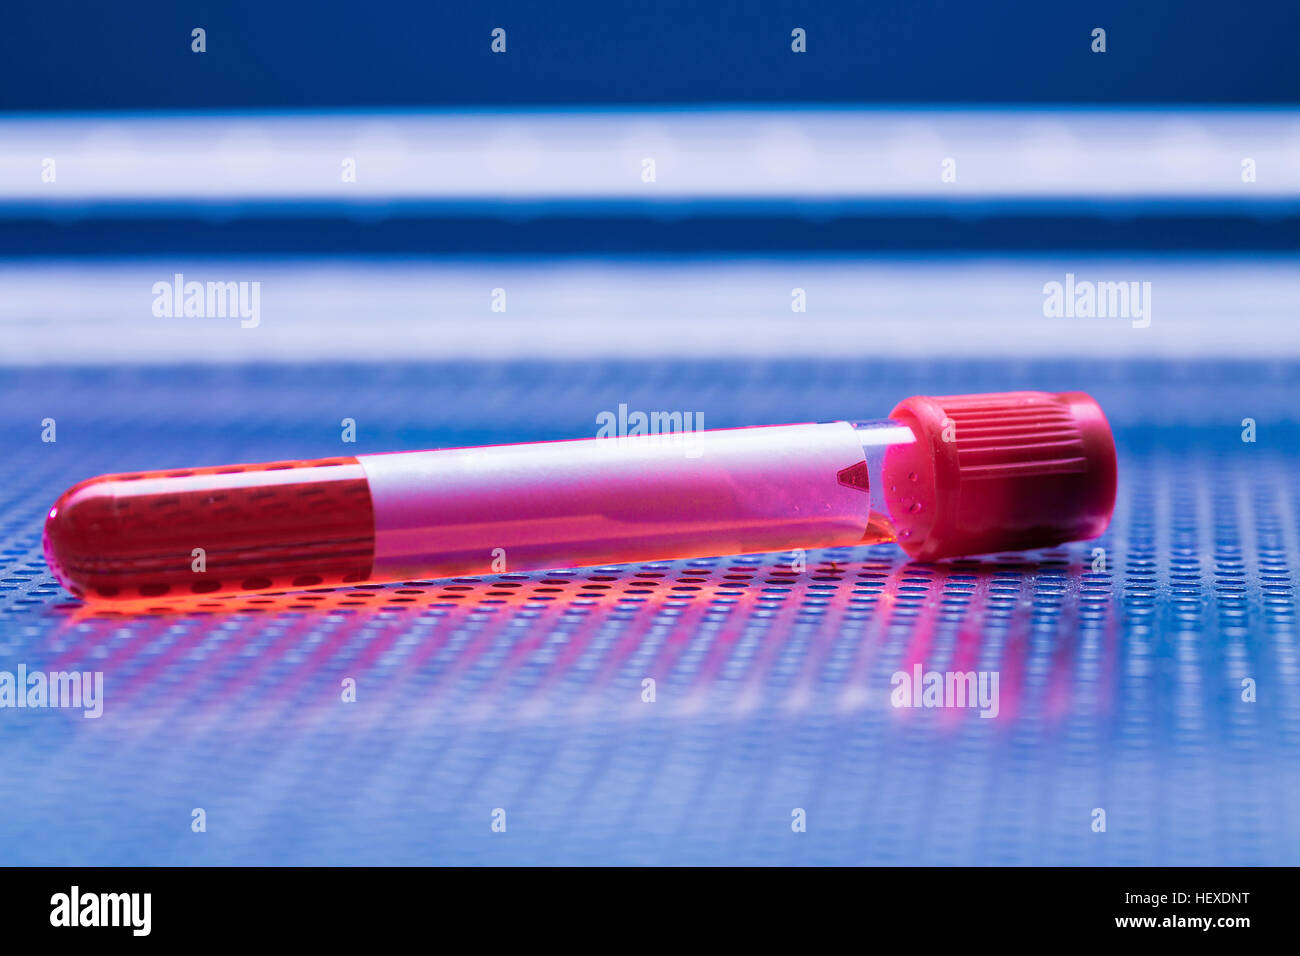 Blood sample in a virology tube. - Stock Image